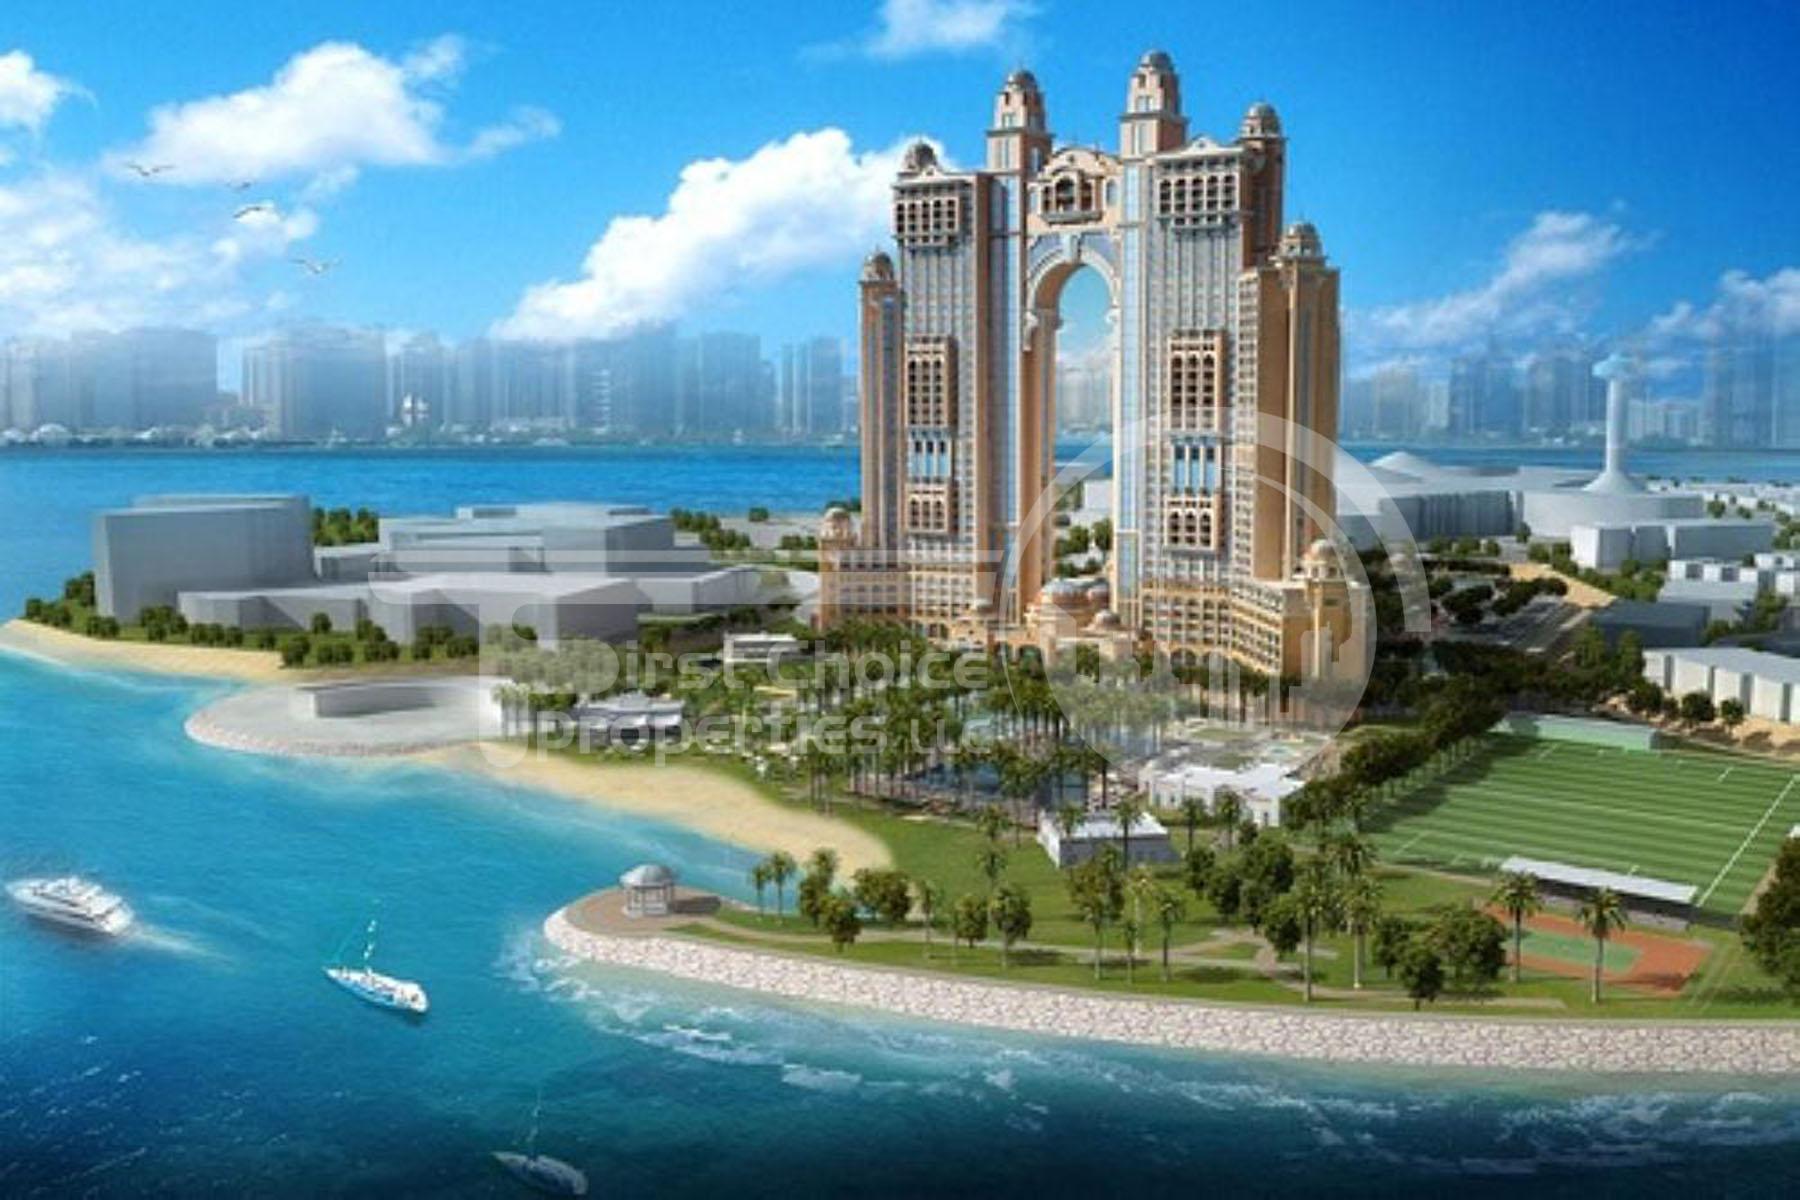 Residential Island - Nareel Island - Al Bateen - Abu Dhabi - UAE (1).jpg